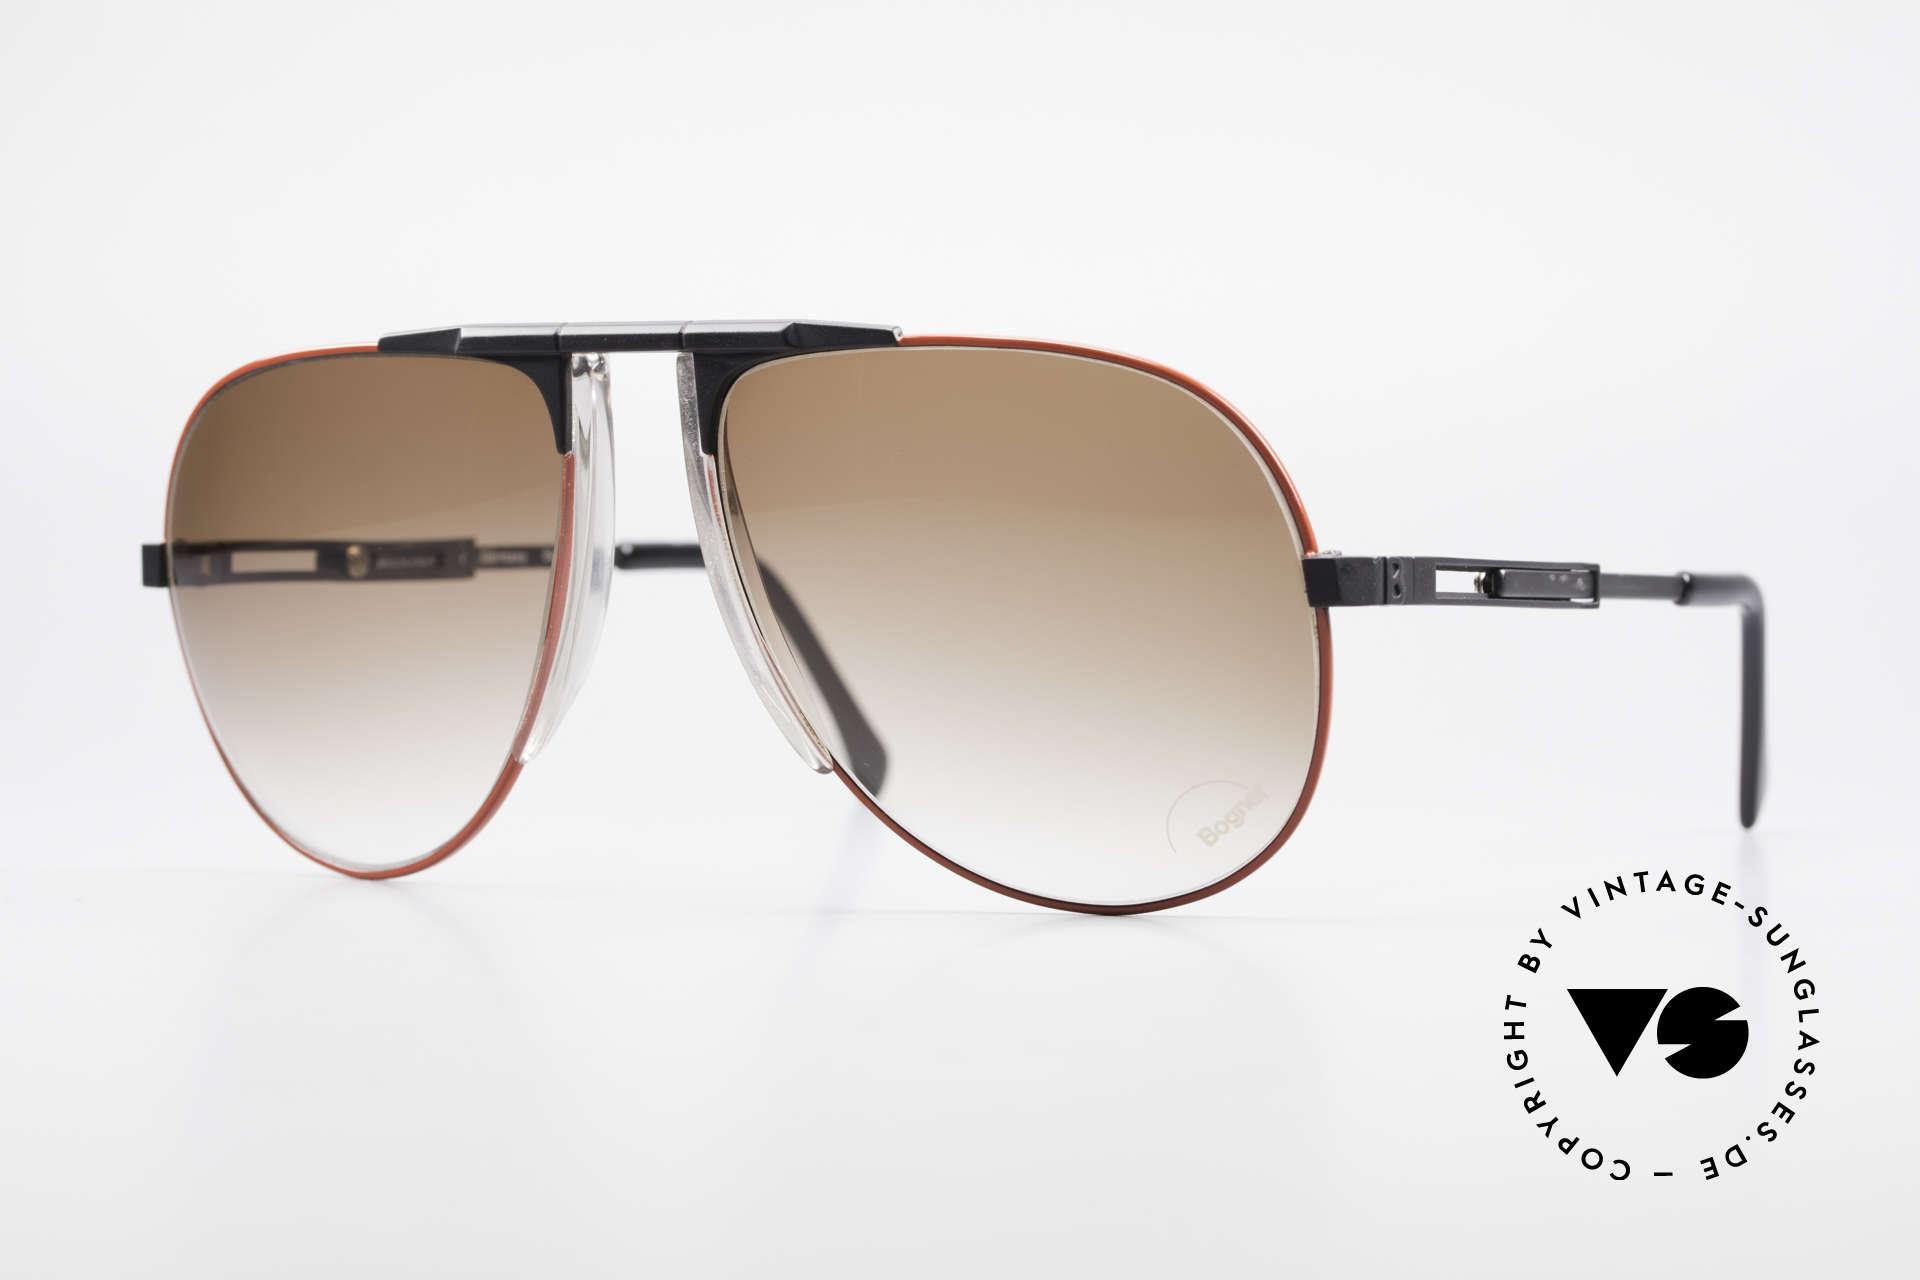 Willy Bogner 7011 Adjustable 80's Sunglasses, the bestseller sunglasses by skiing-ace Willy BOGNER, Made for Men